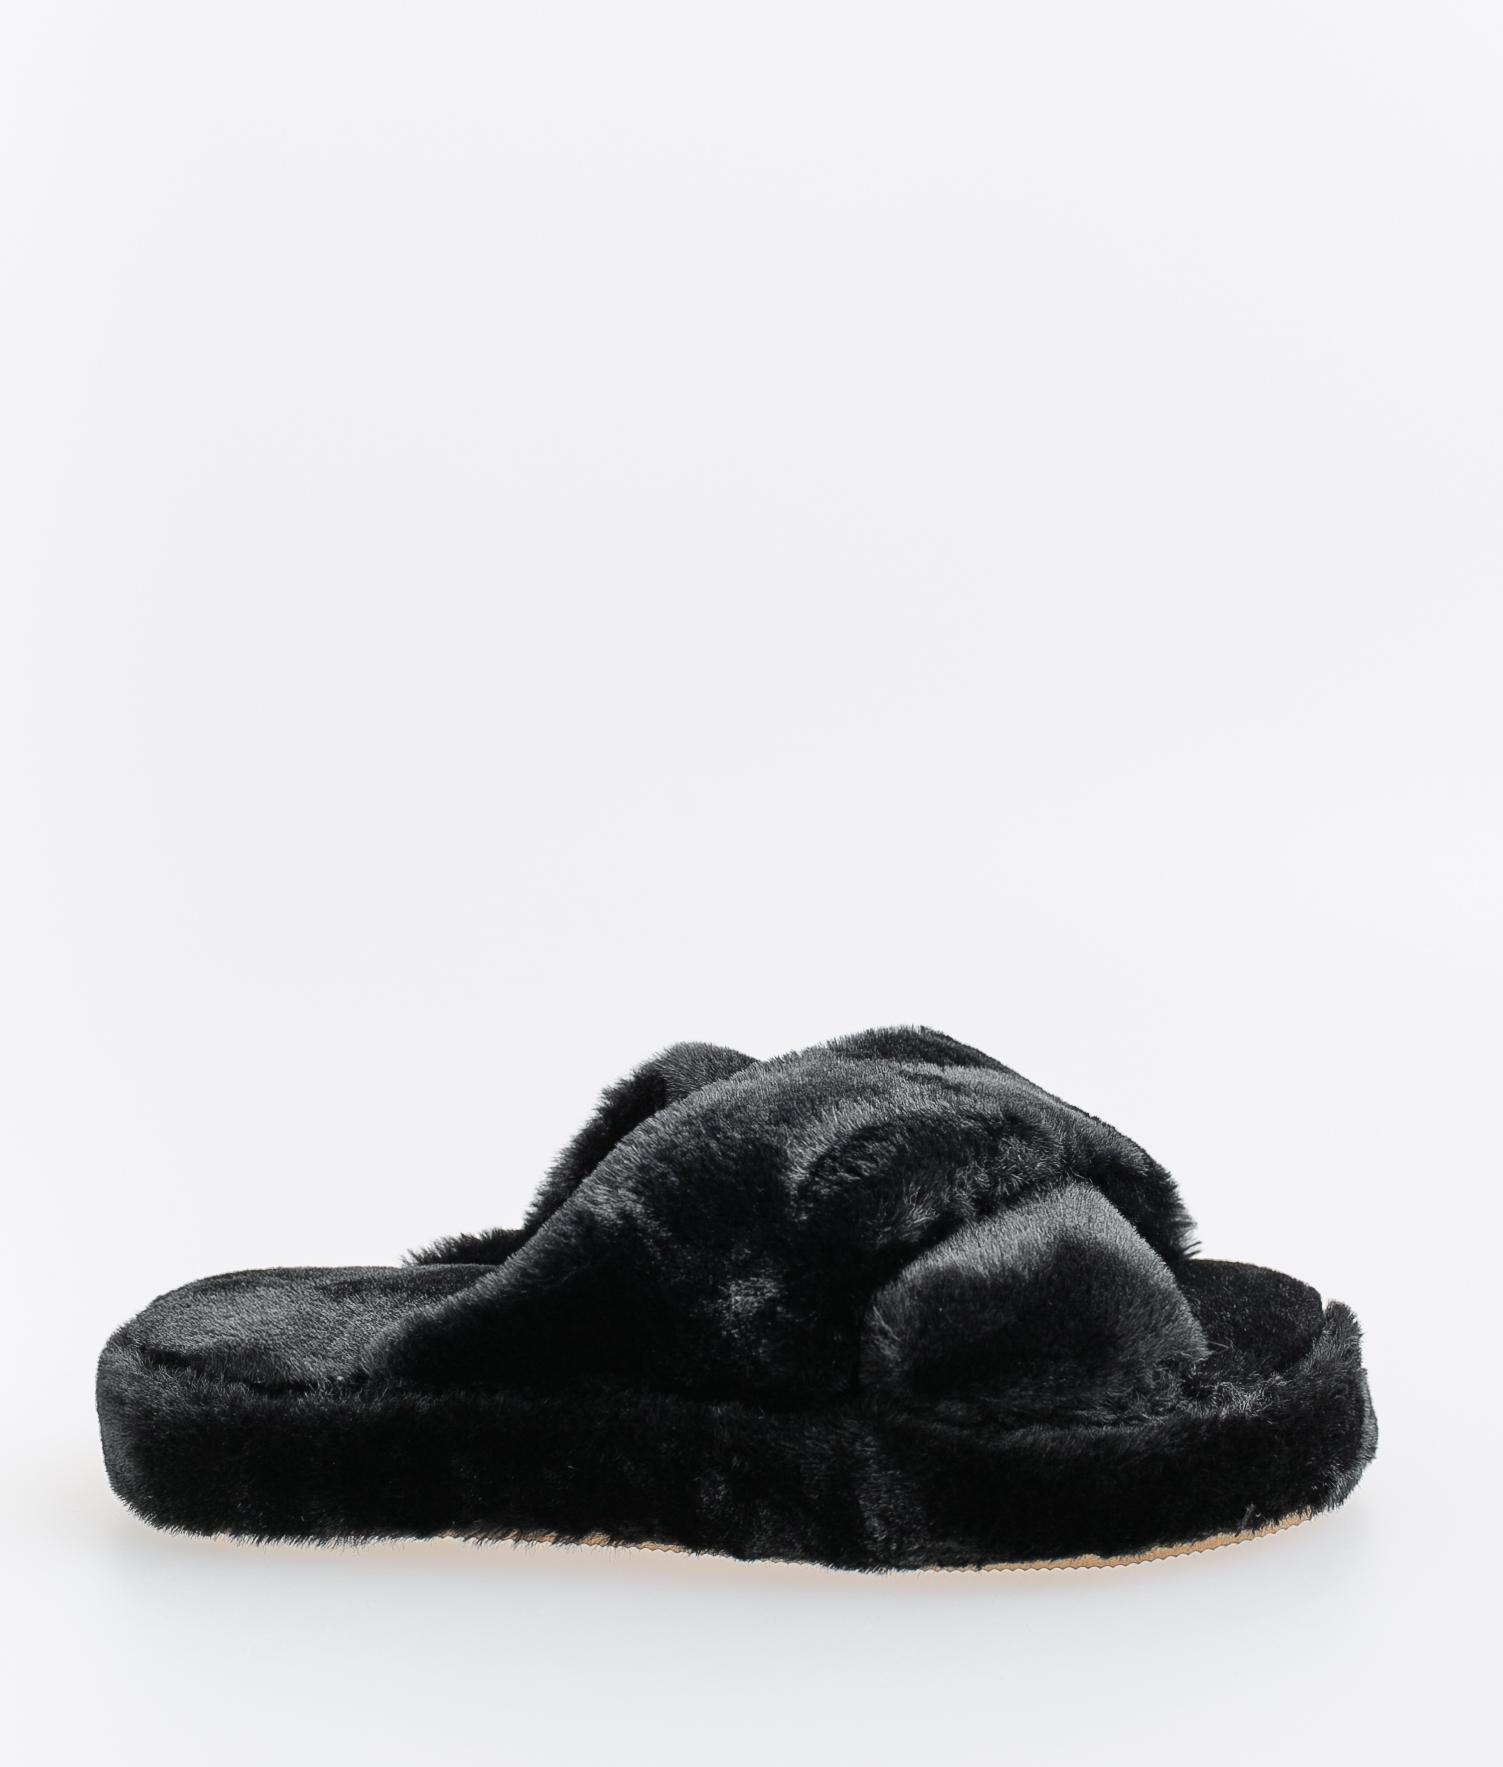 PIELA SLIPPERS - BLACK